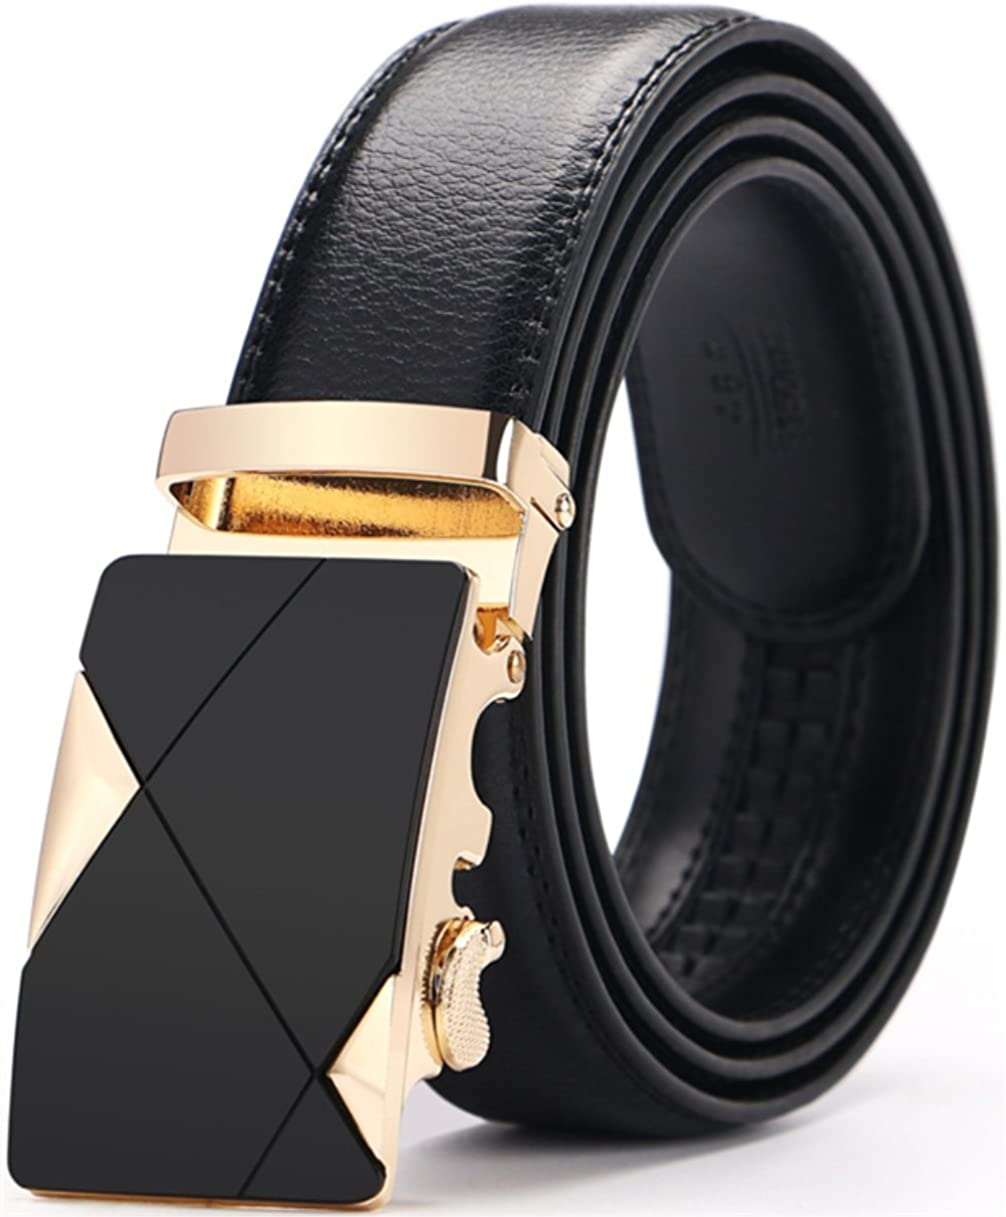 Mens Leather Belt Leather Casual Automatic Buckle Ratchet Belt Buckle